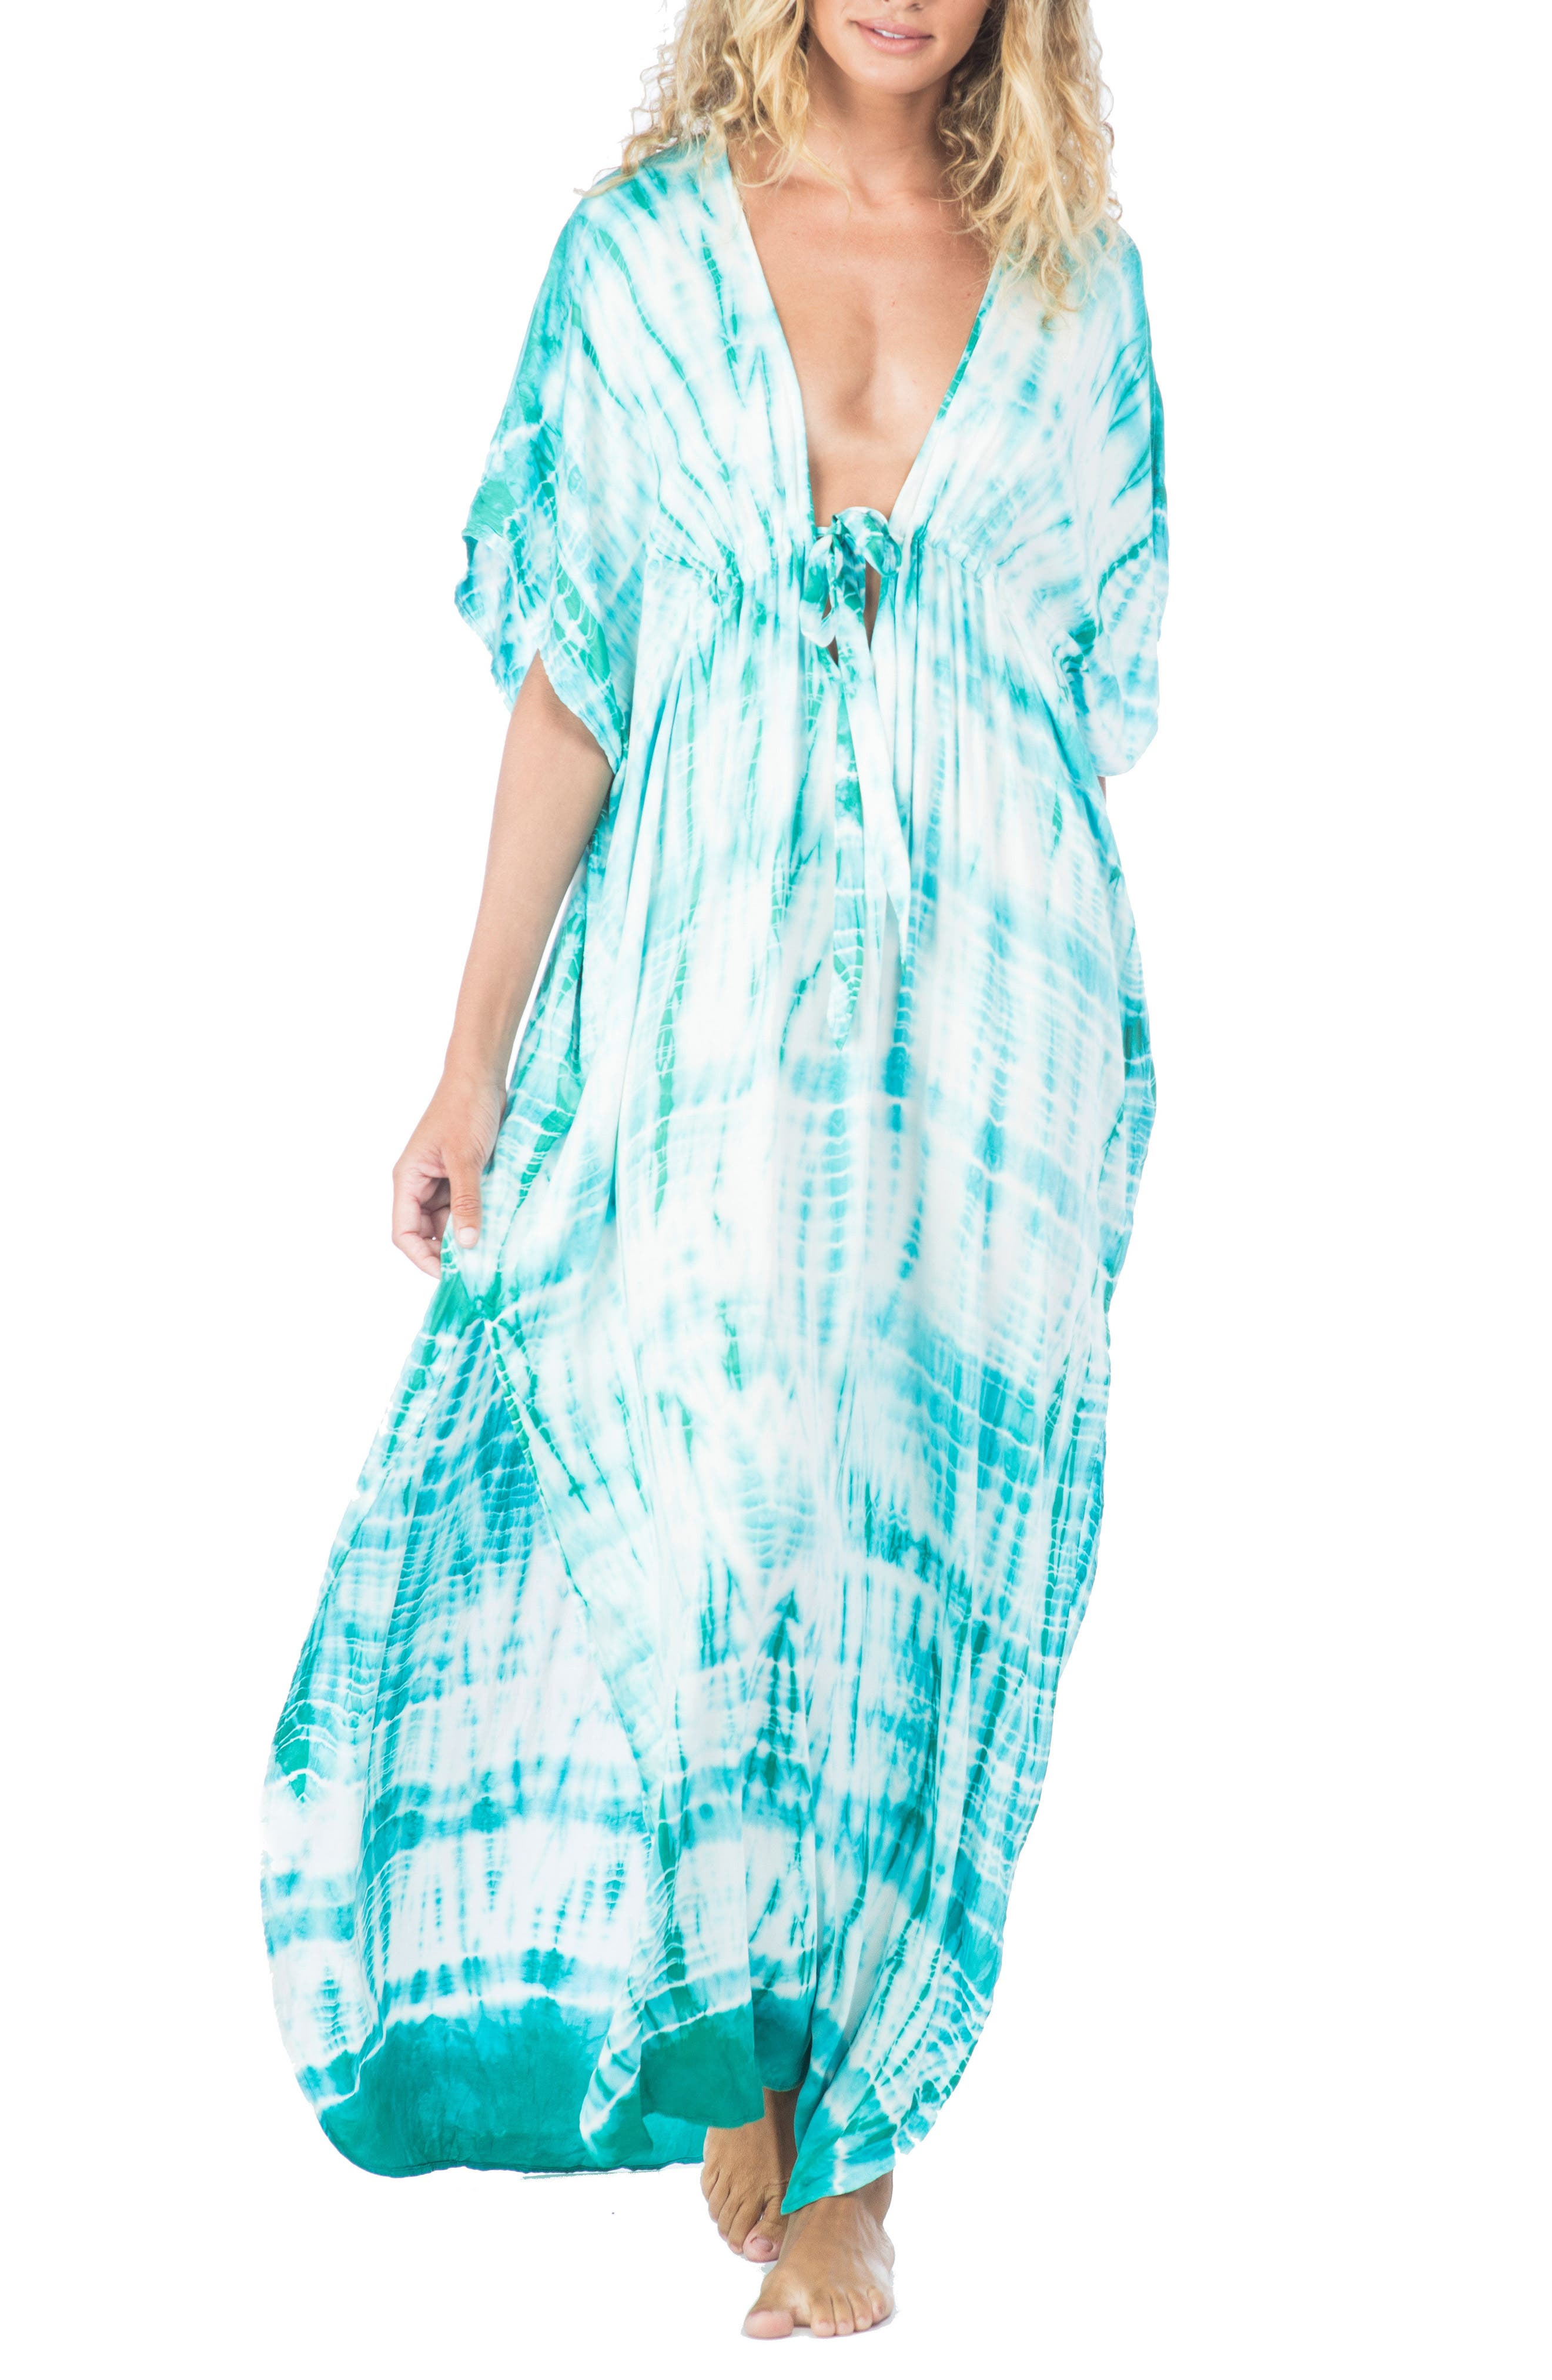 Green Dragon South Beach Tie Dye Ashley Cover-Up Dress